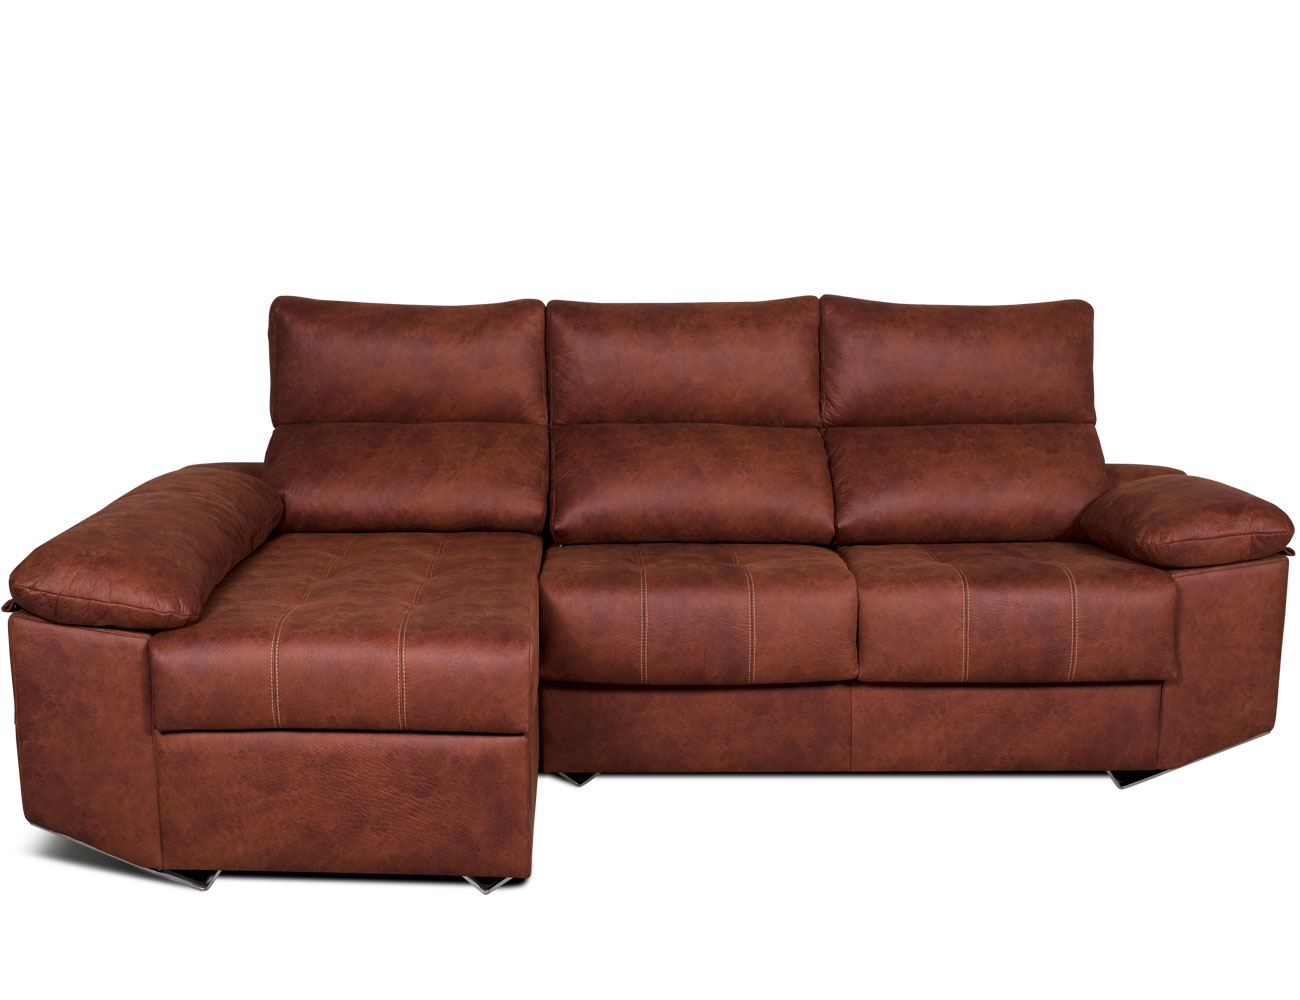 Sofa chaiselongue moderno patas forma tejido anti manchas 21